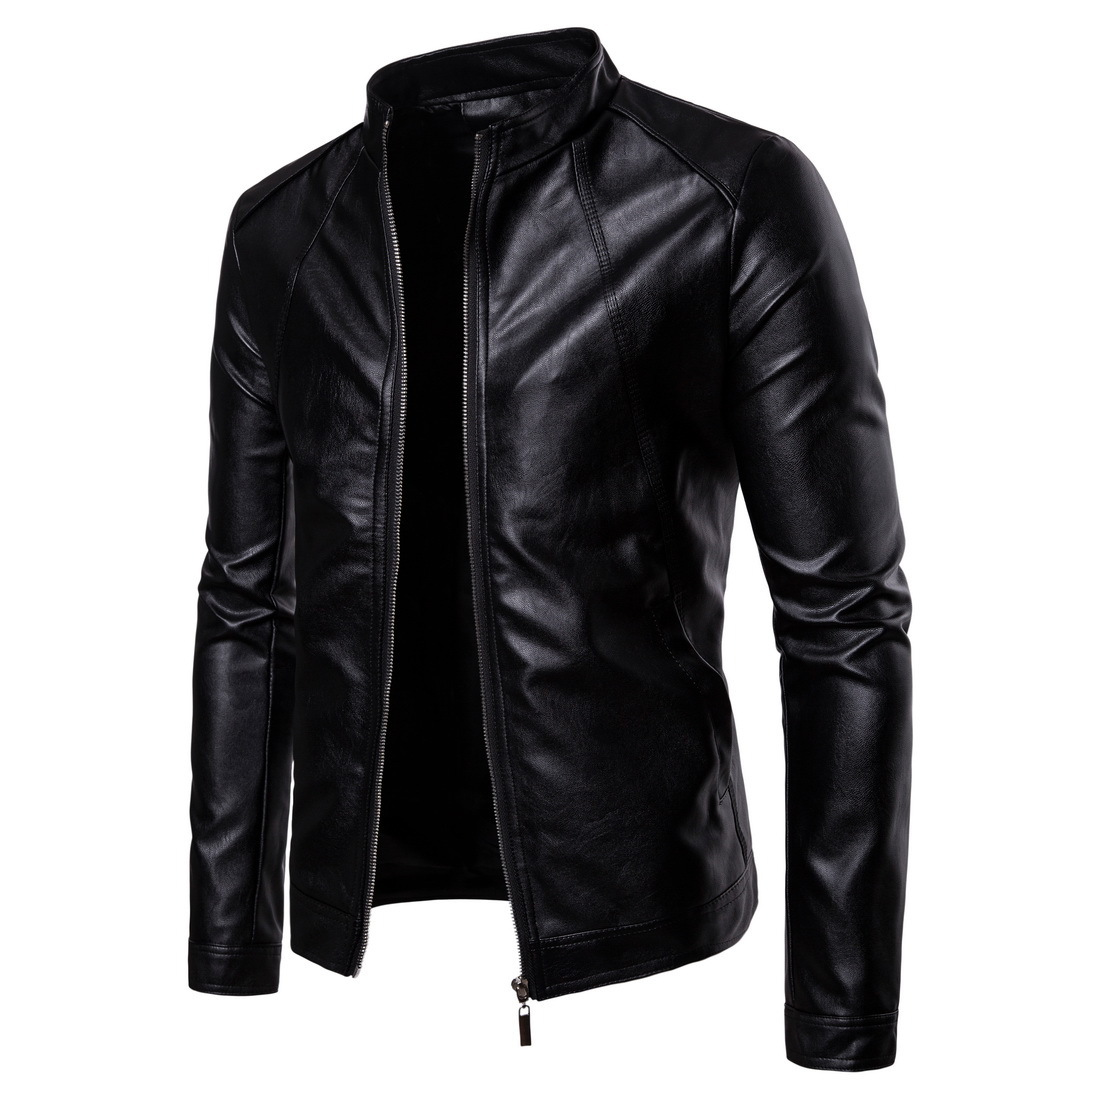 Fall 2019 new collar male locomotive leather fashion pure color washed PU leather jacket мужские кожанные куртки с косой молнией